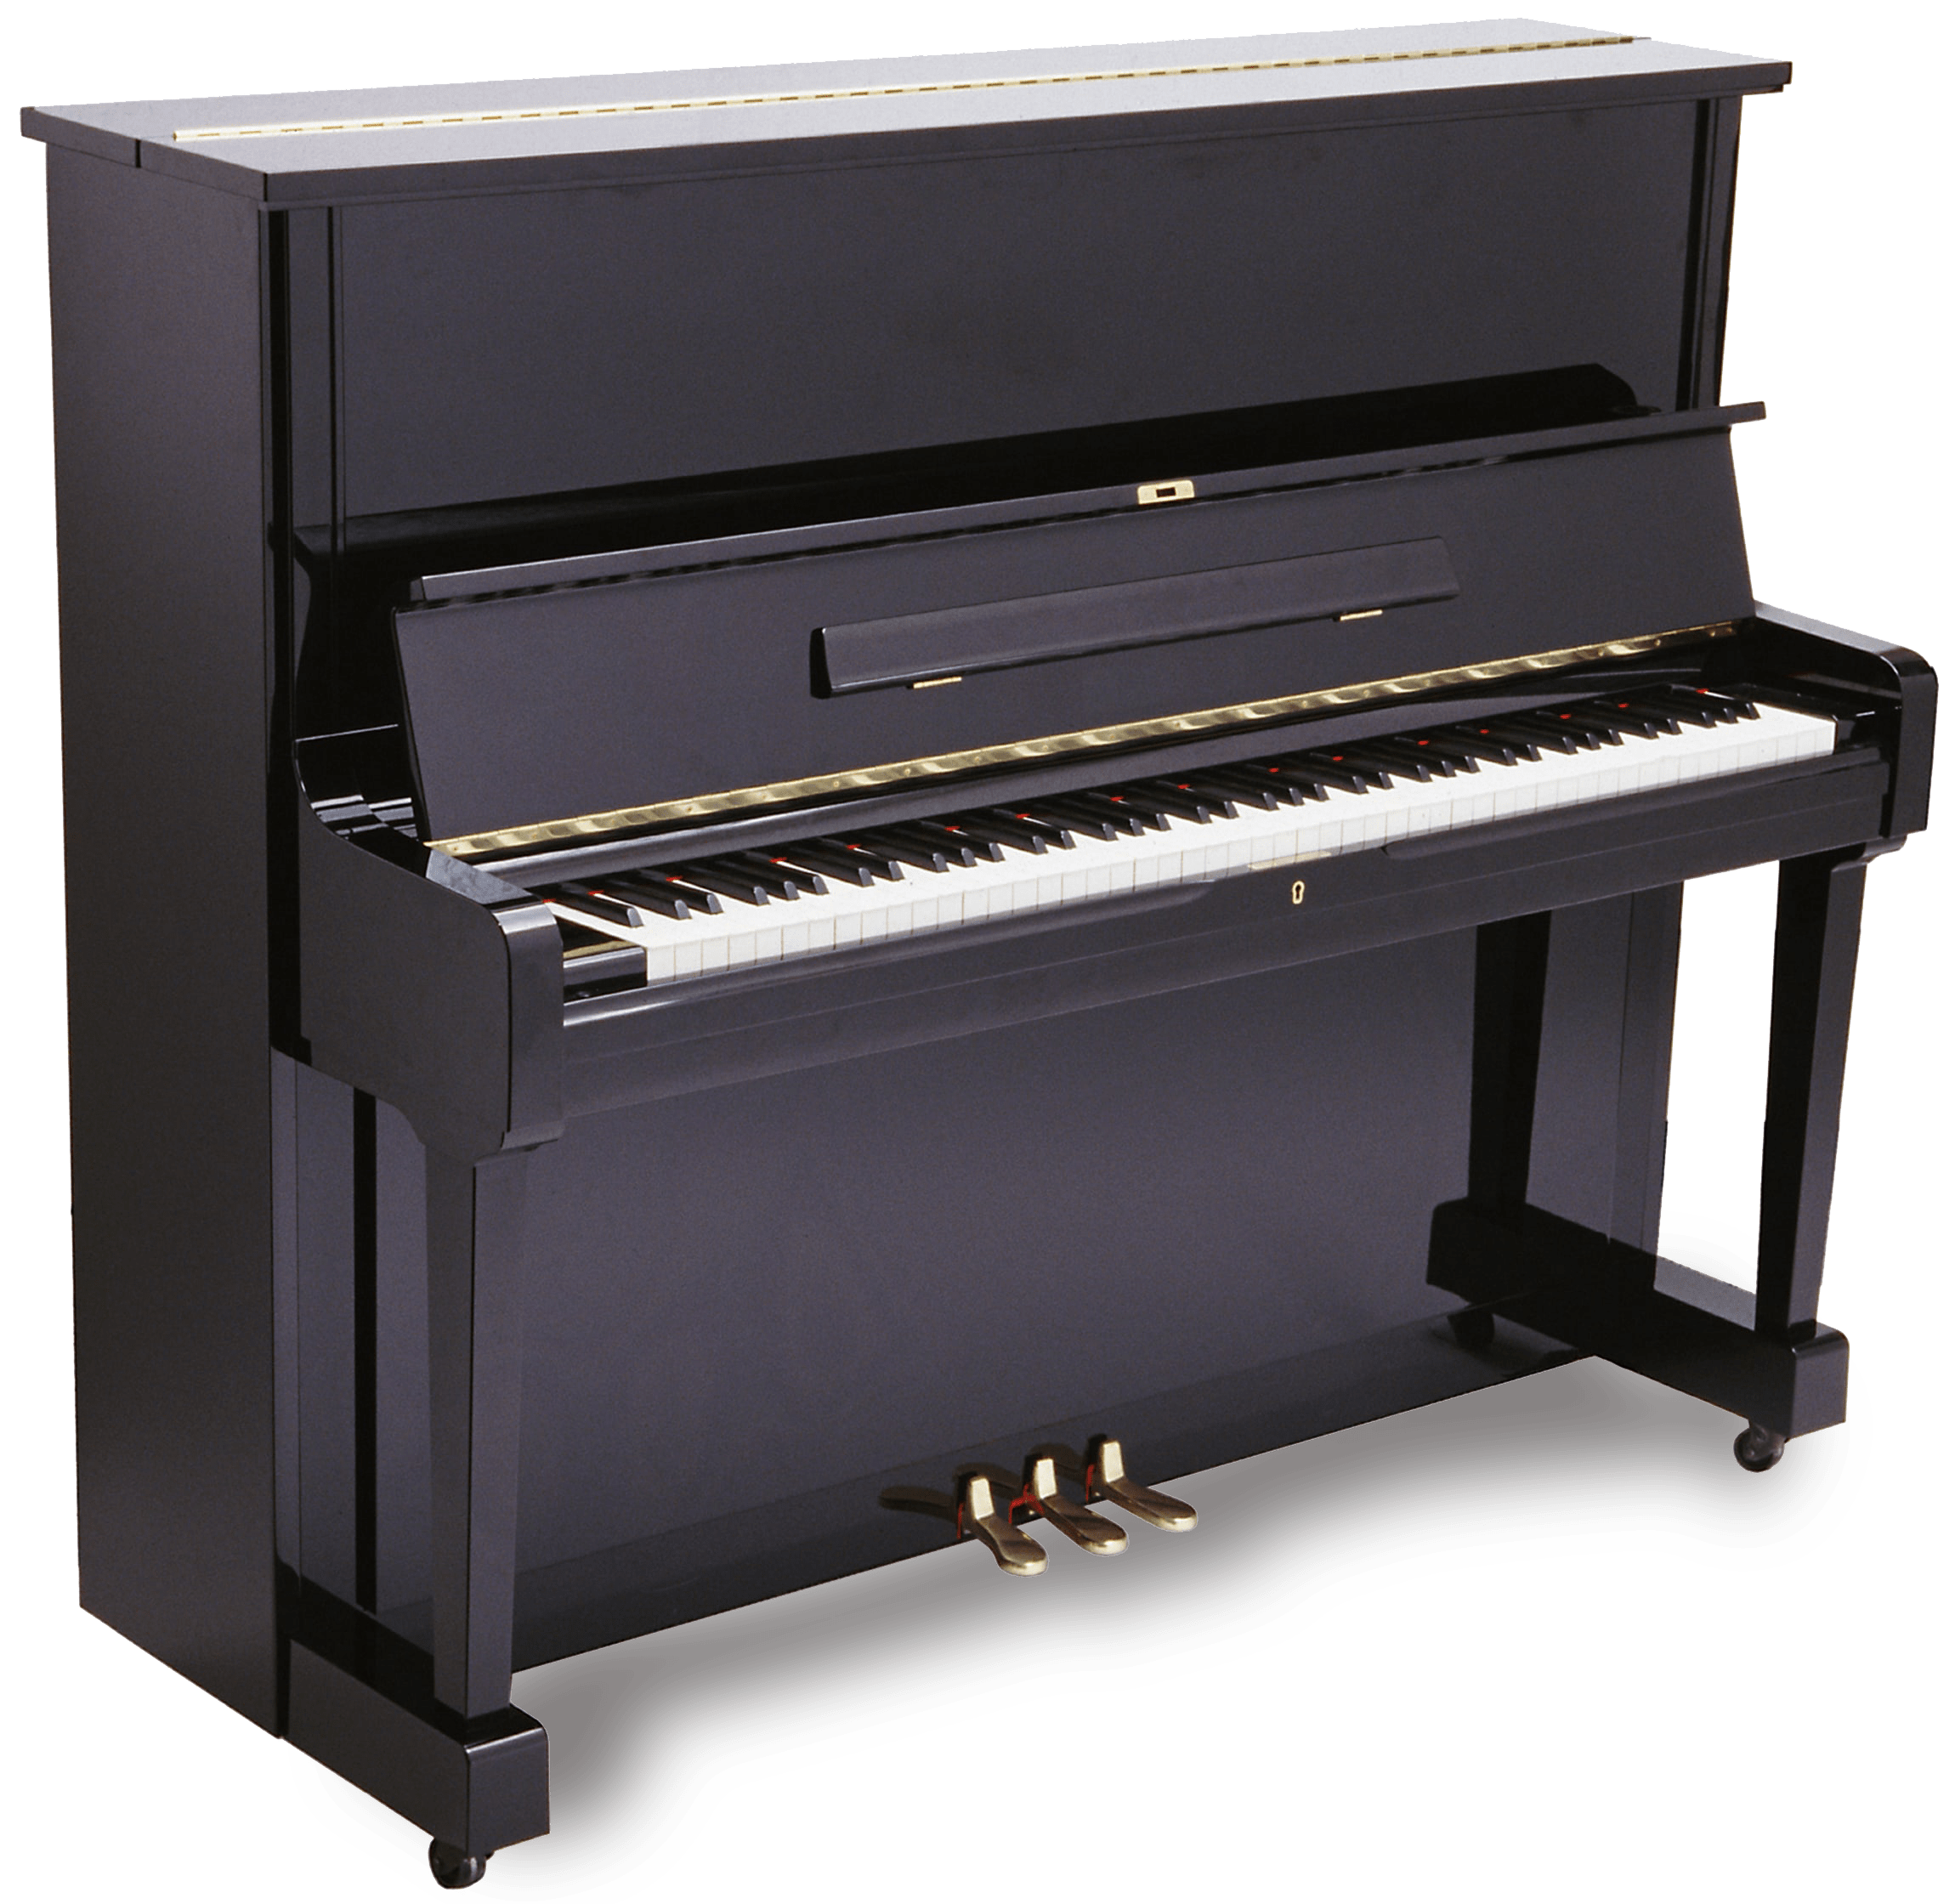 Piano Storage Colorado Springs Co Check Mate Piano Movers